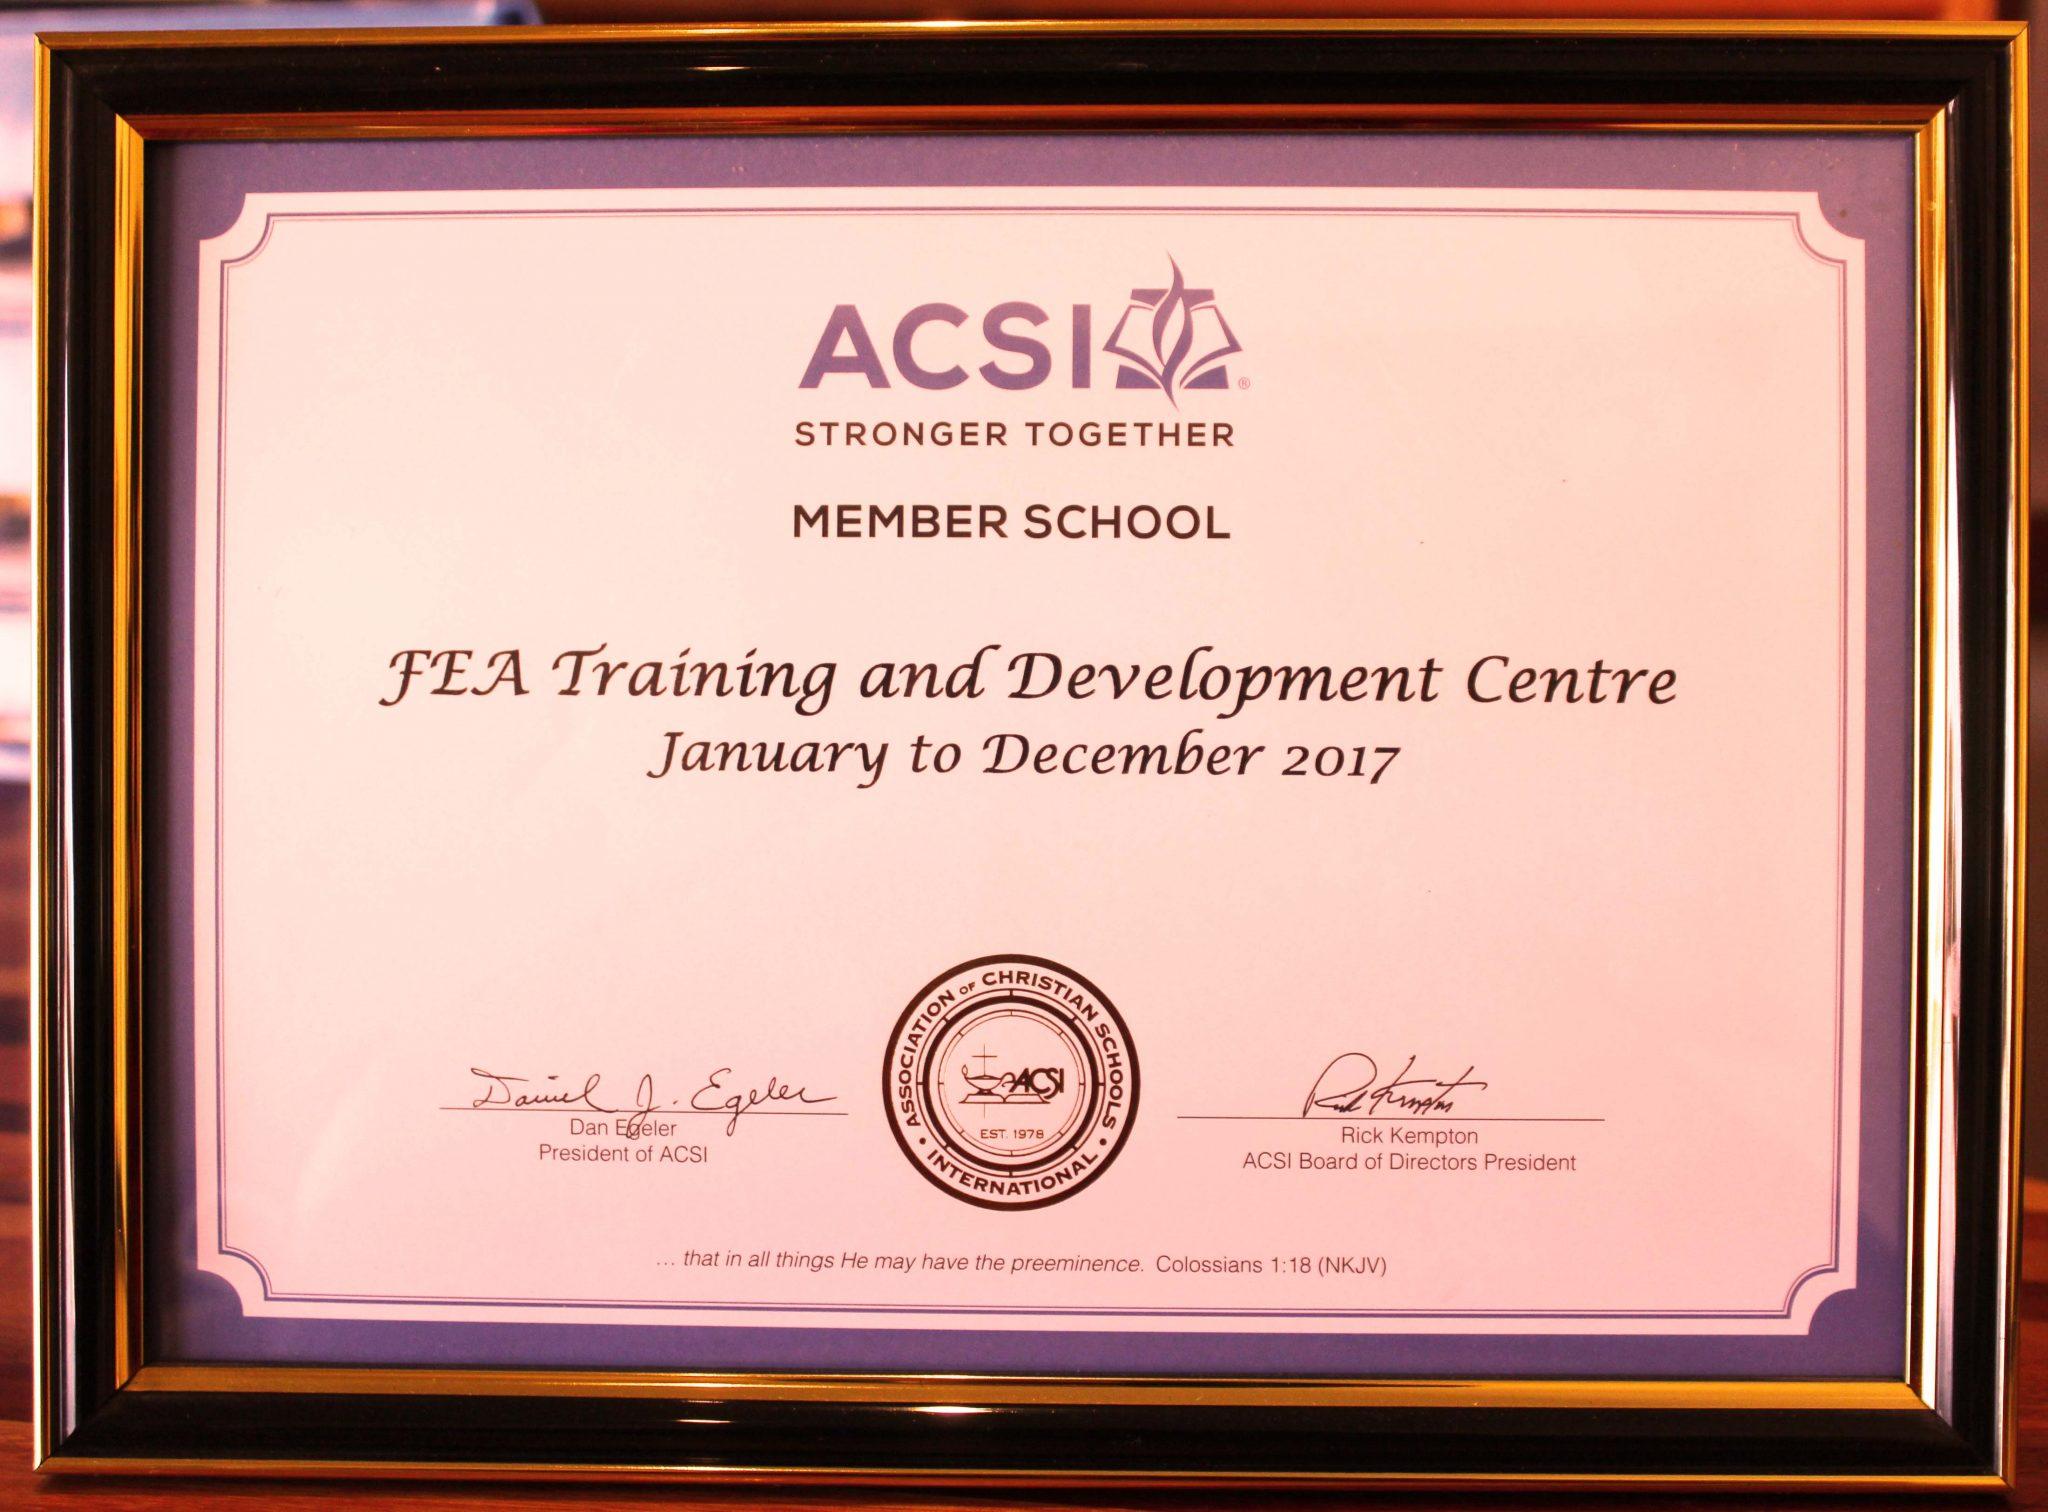 acsi certificate fea membership association schools christian international